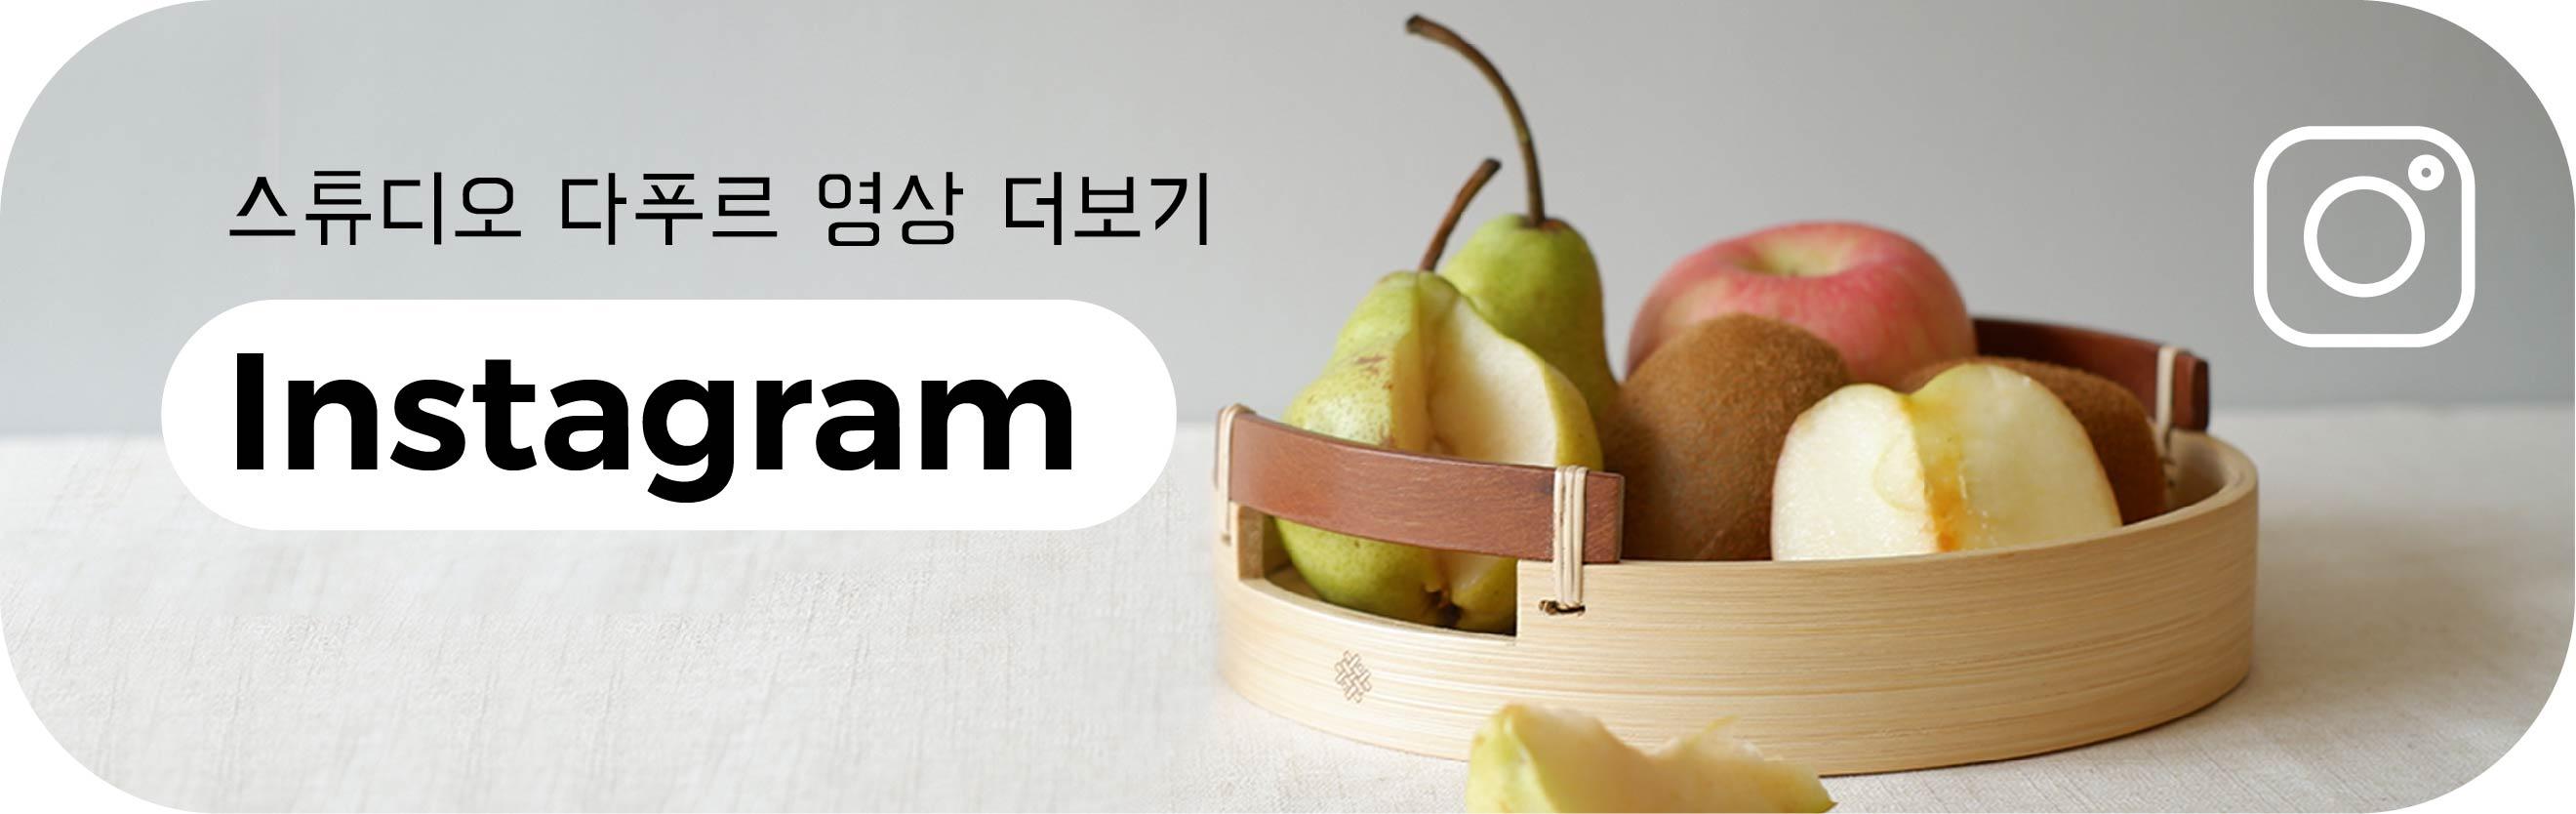 Studio Dapur Korea Instagram